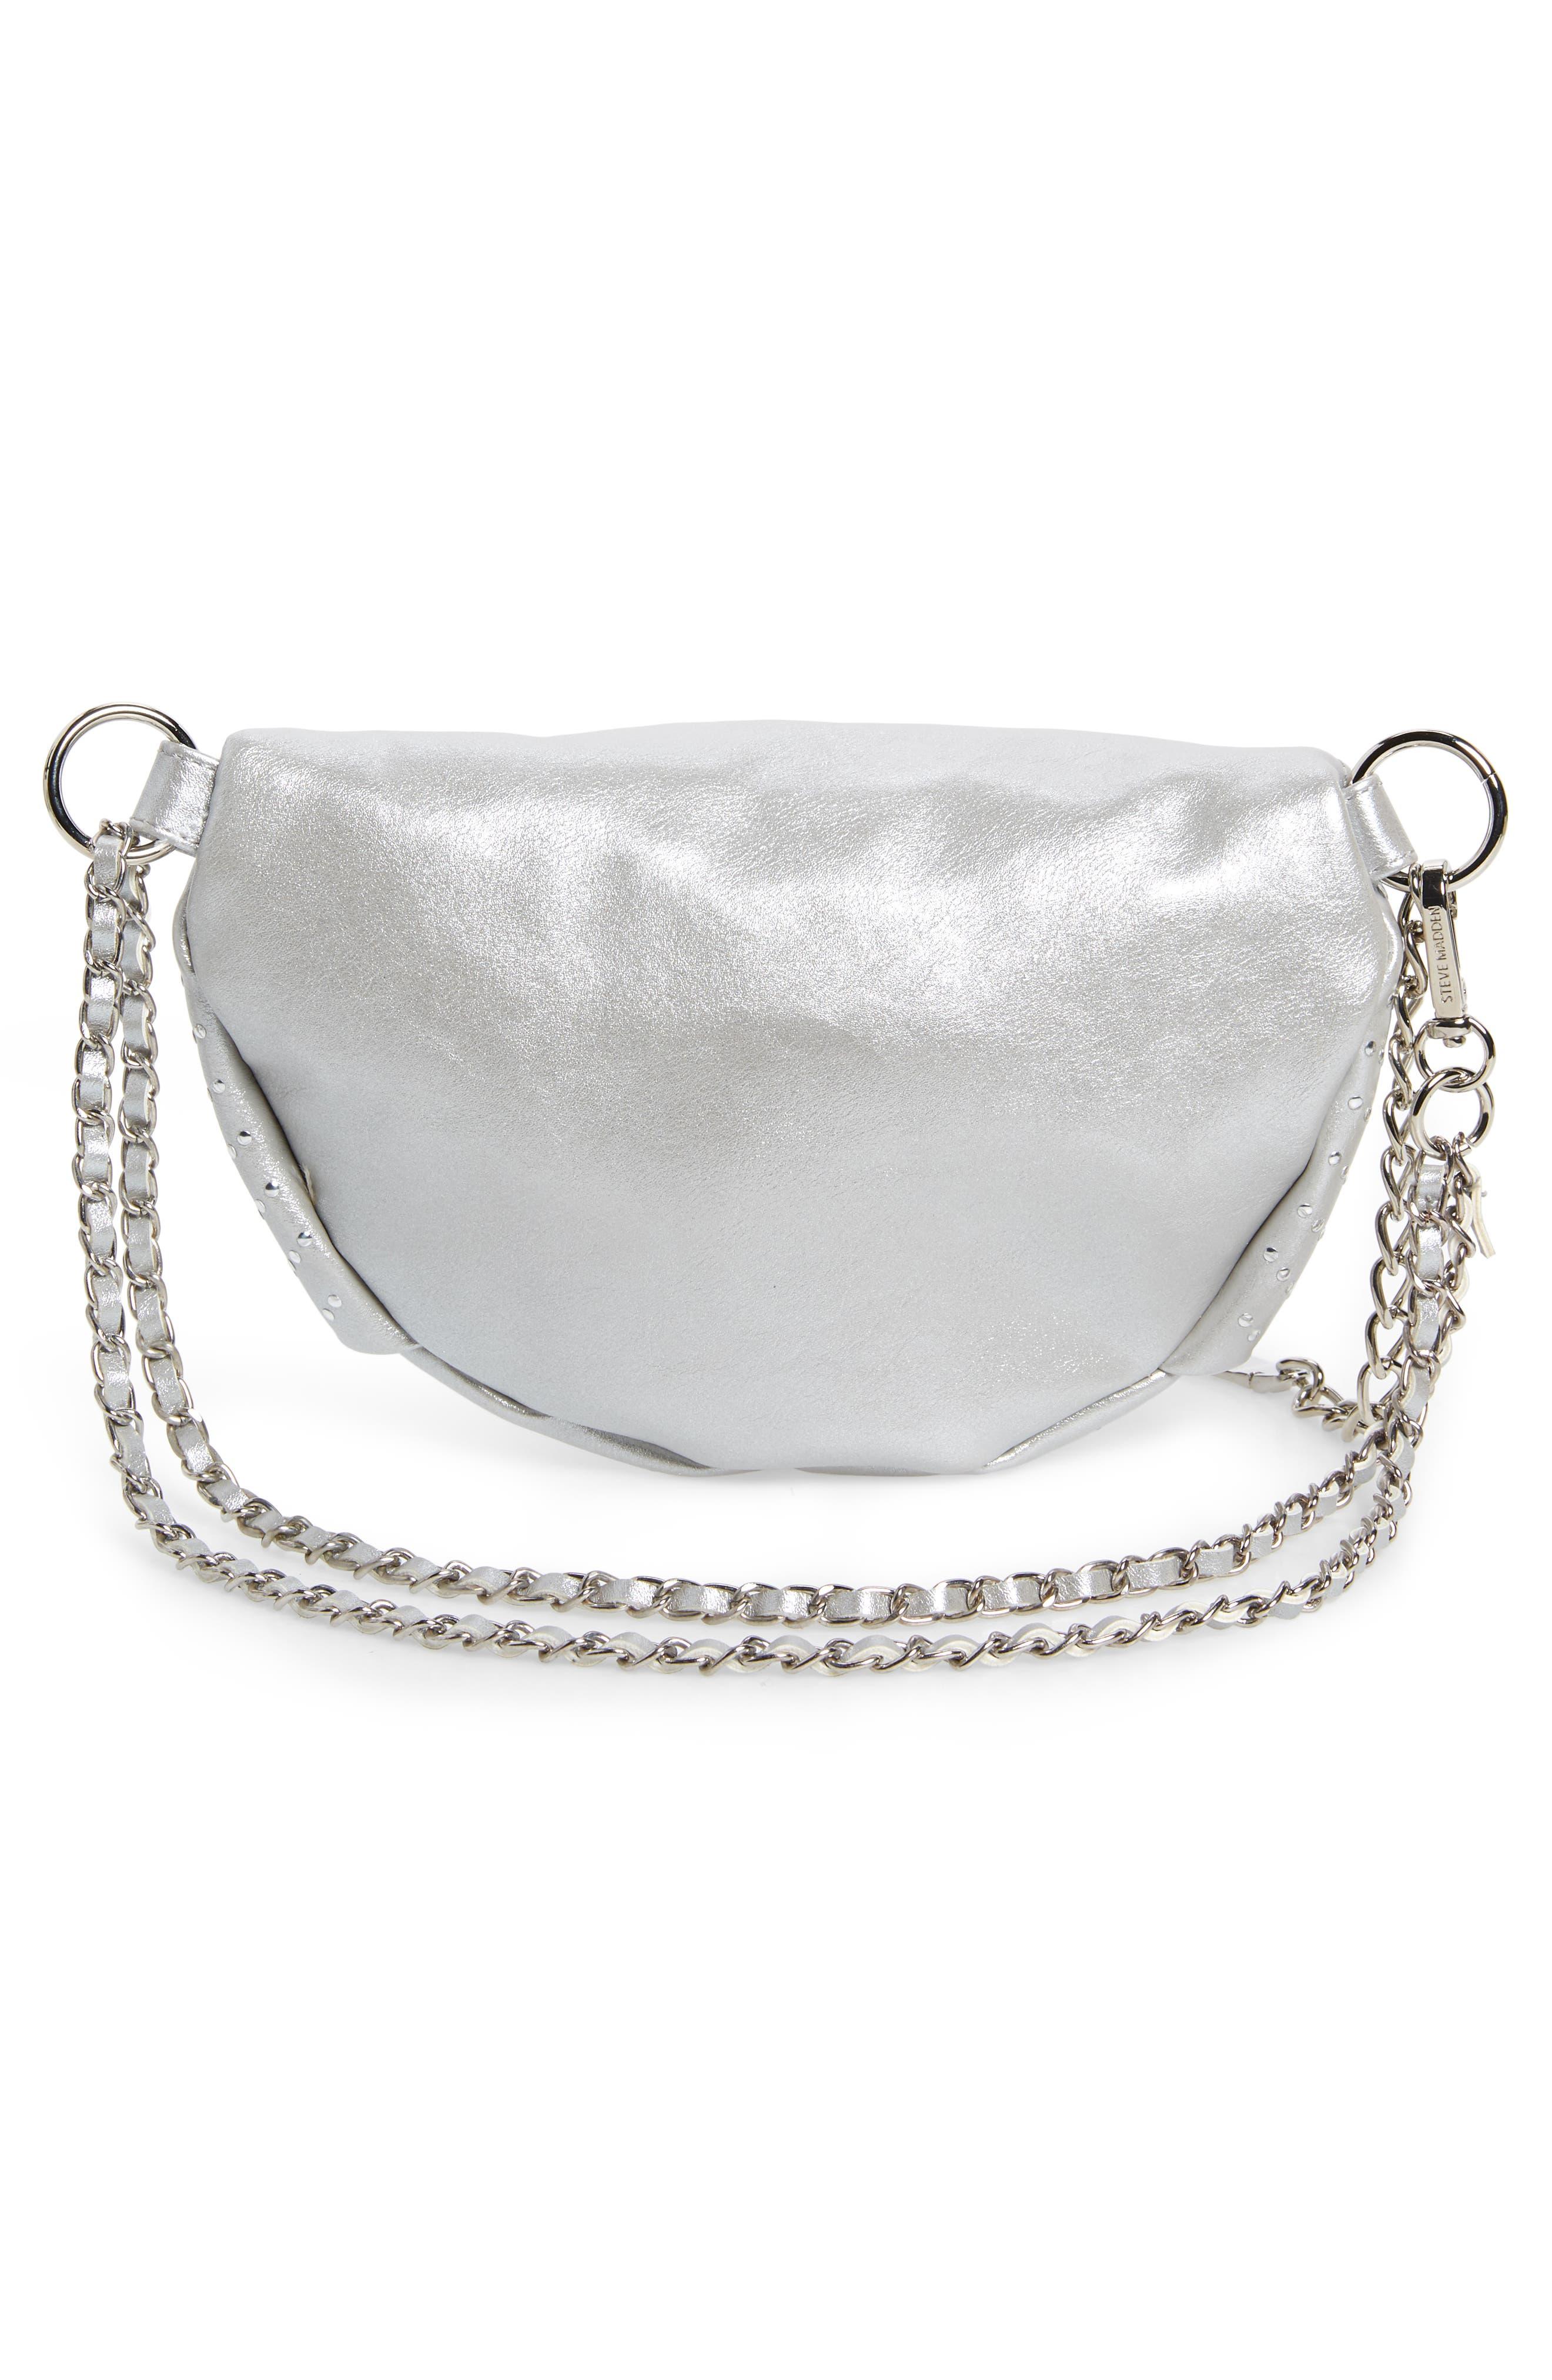 Becca Metallic Studded Belt Bag,                             Alternate thumbnail 4, color,                             SILVER